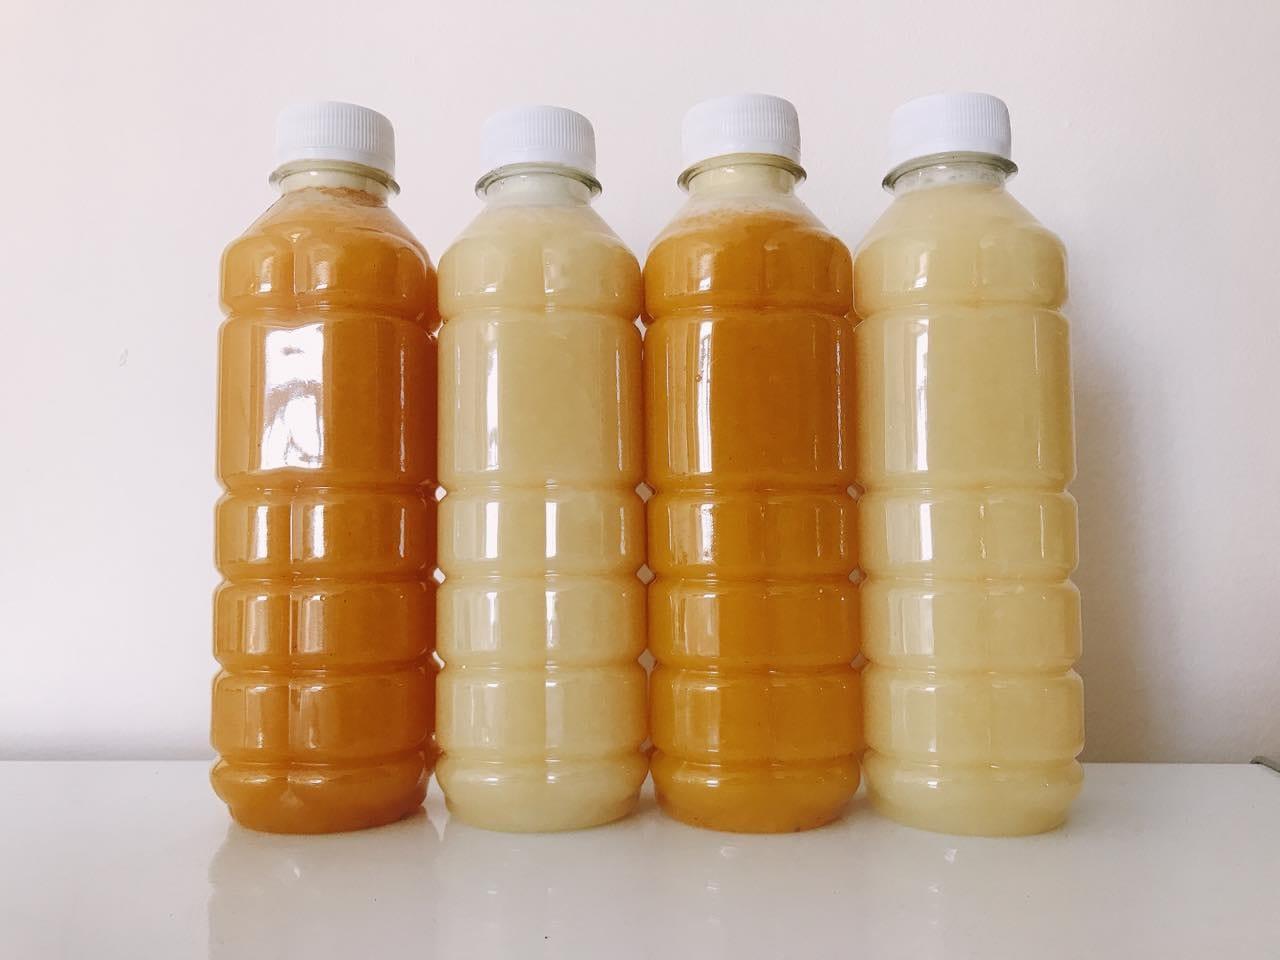 Buoi Ep Hai Dangポメロジュースとパイナップルジュース